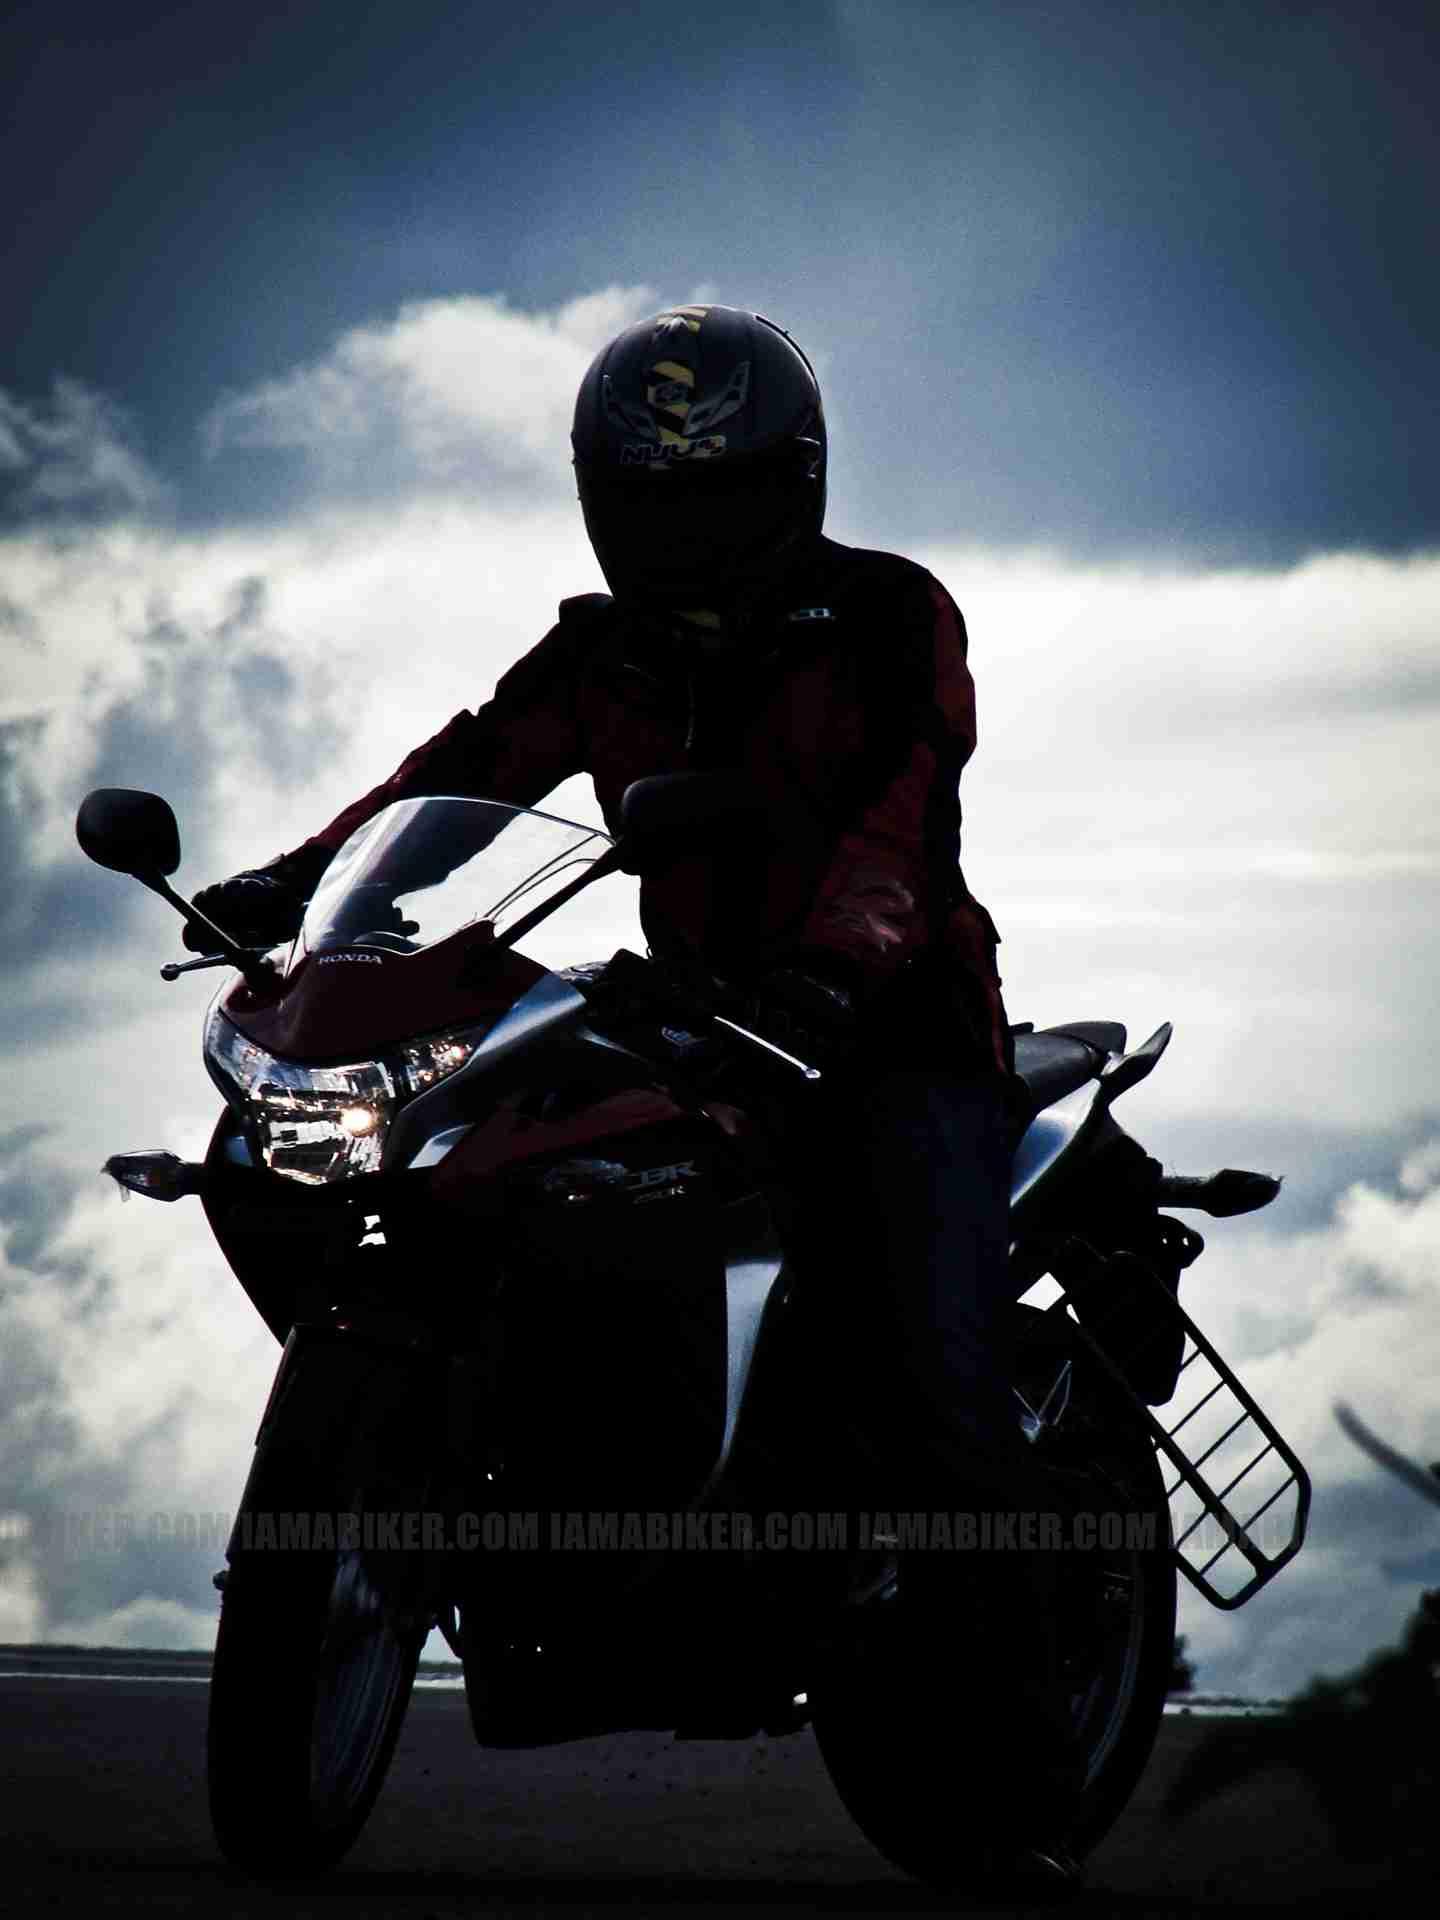 Honda CBR 250R HD wallpapers   IAMABIKER - Everything ...